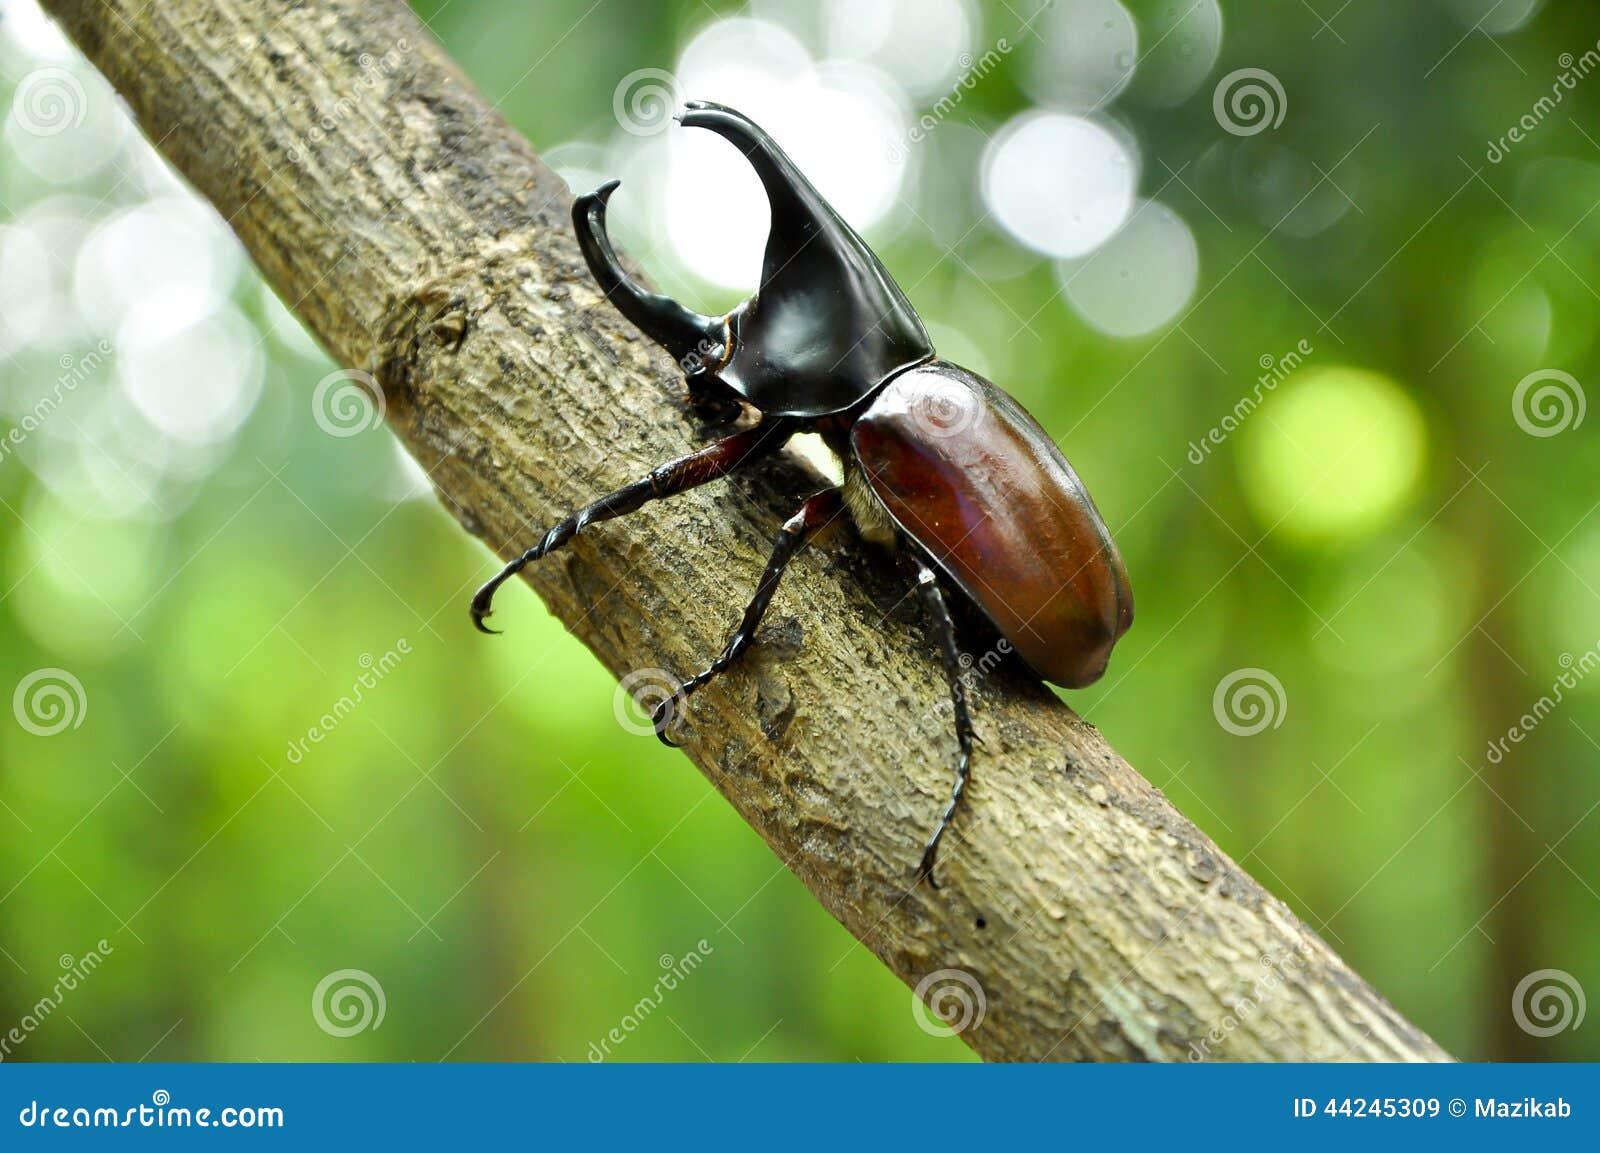 Rhino Beetle